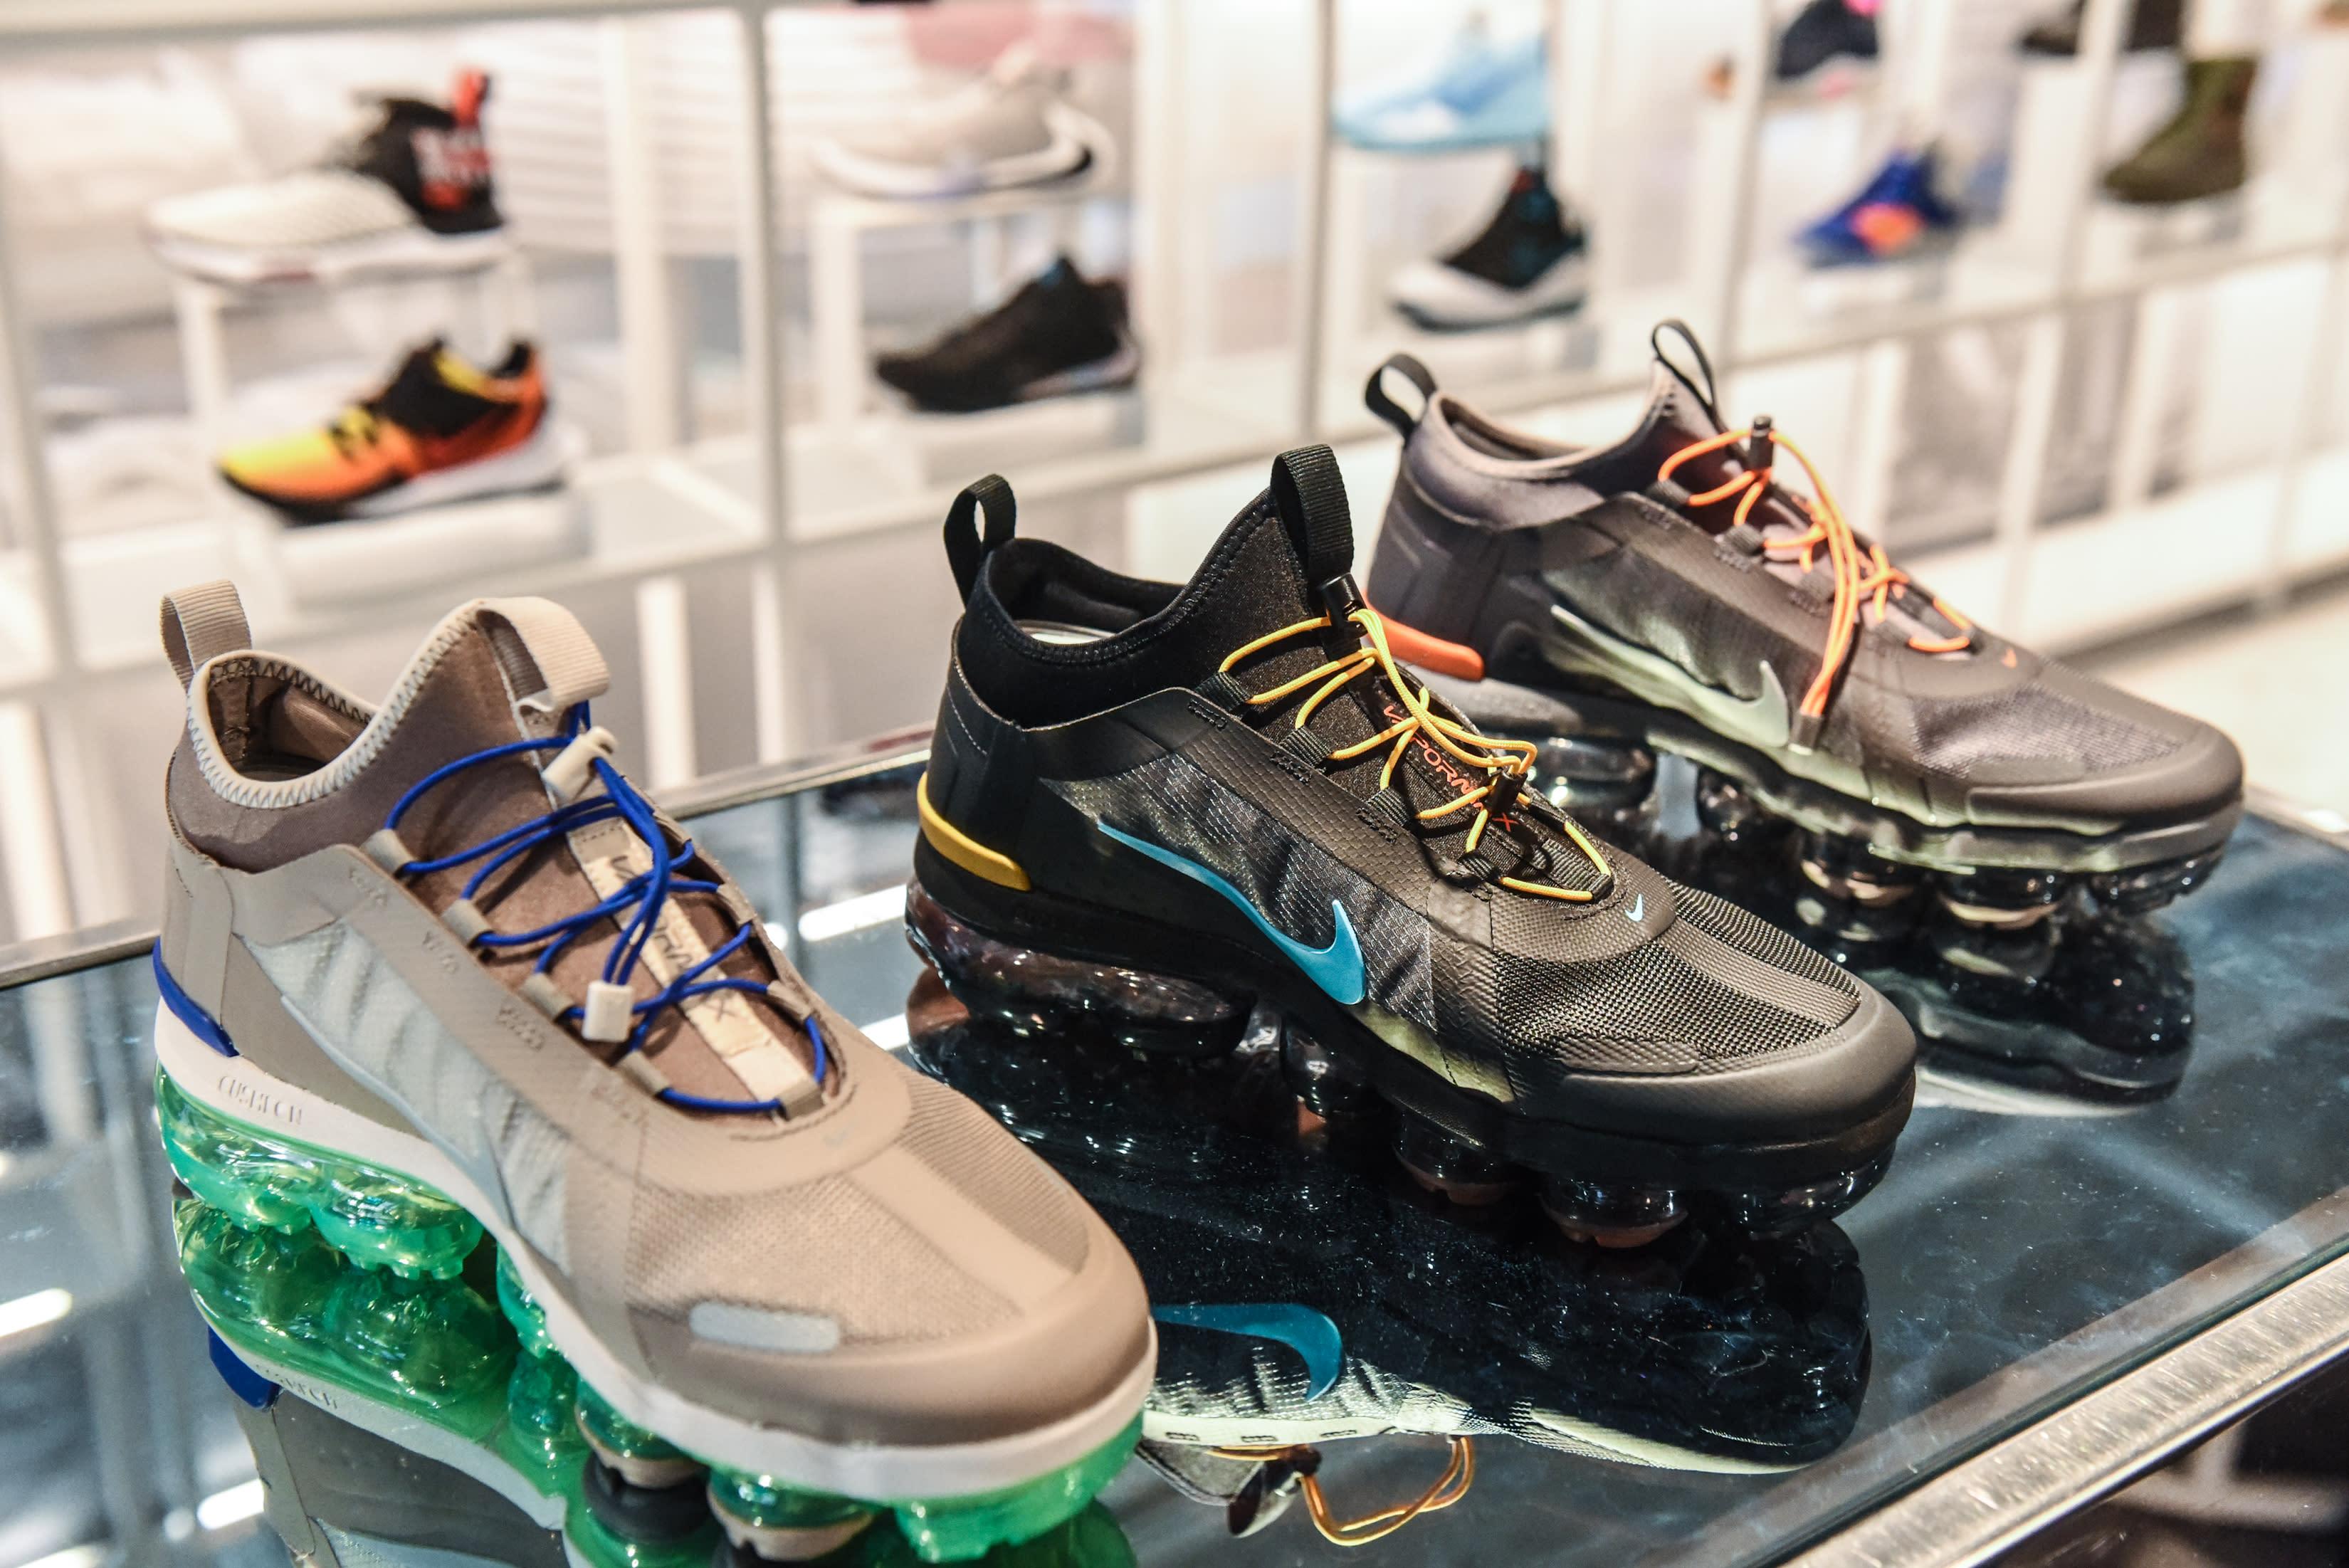 Nike 3Q earnings meet expectations, sales beat estimates